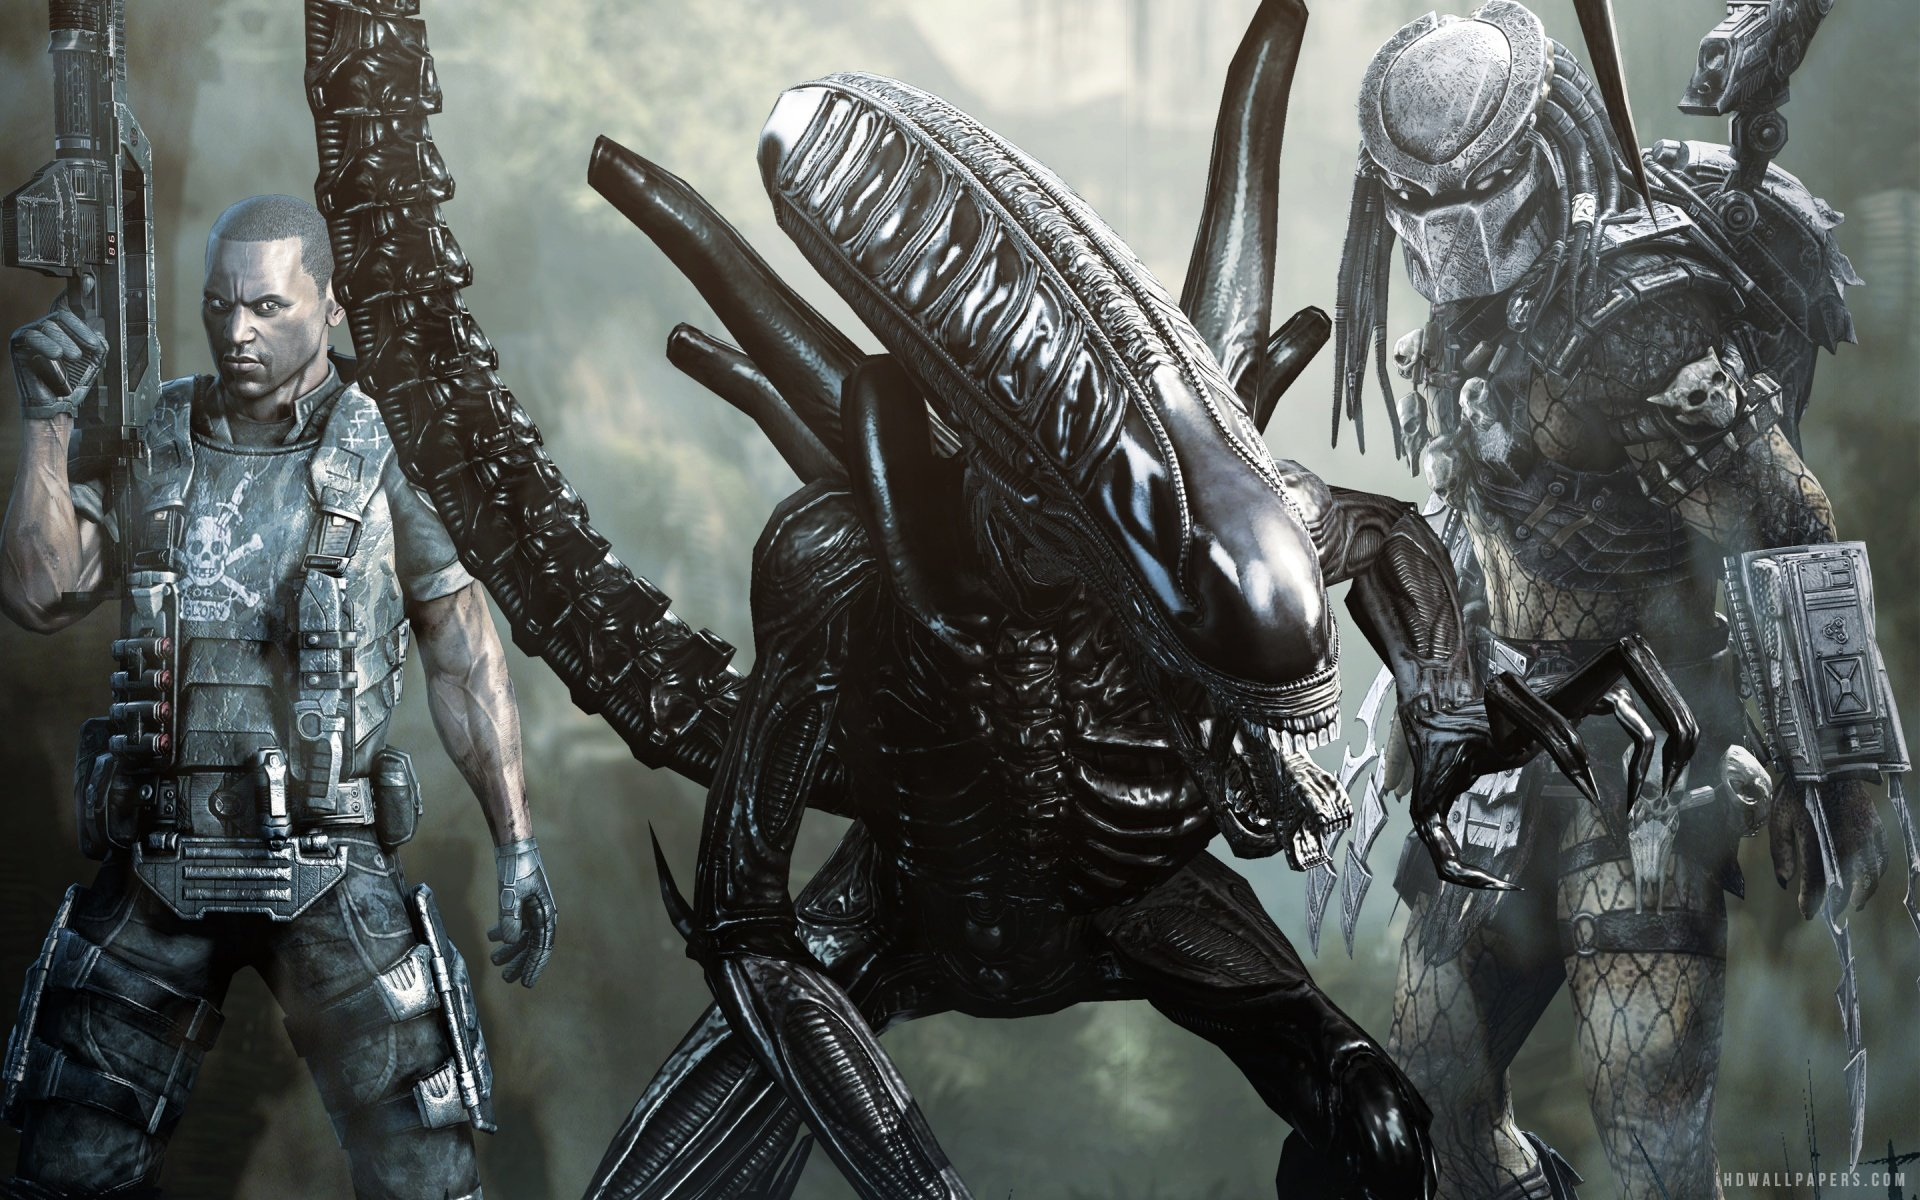 Free Download Aliens Vs Predator Game Hd Wallpaper Ihd Wallpapers